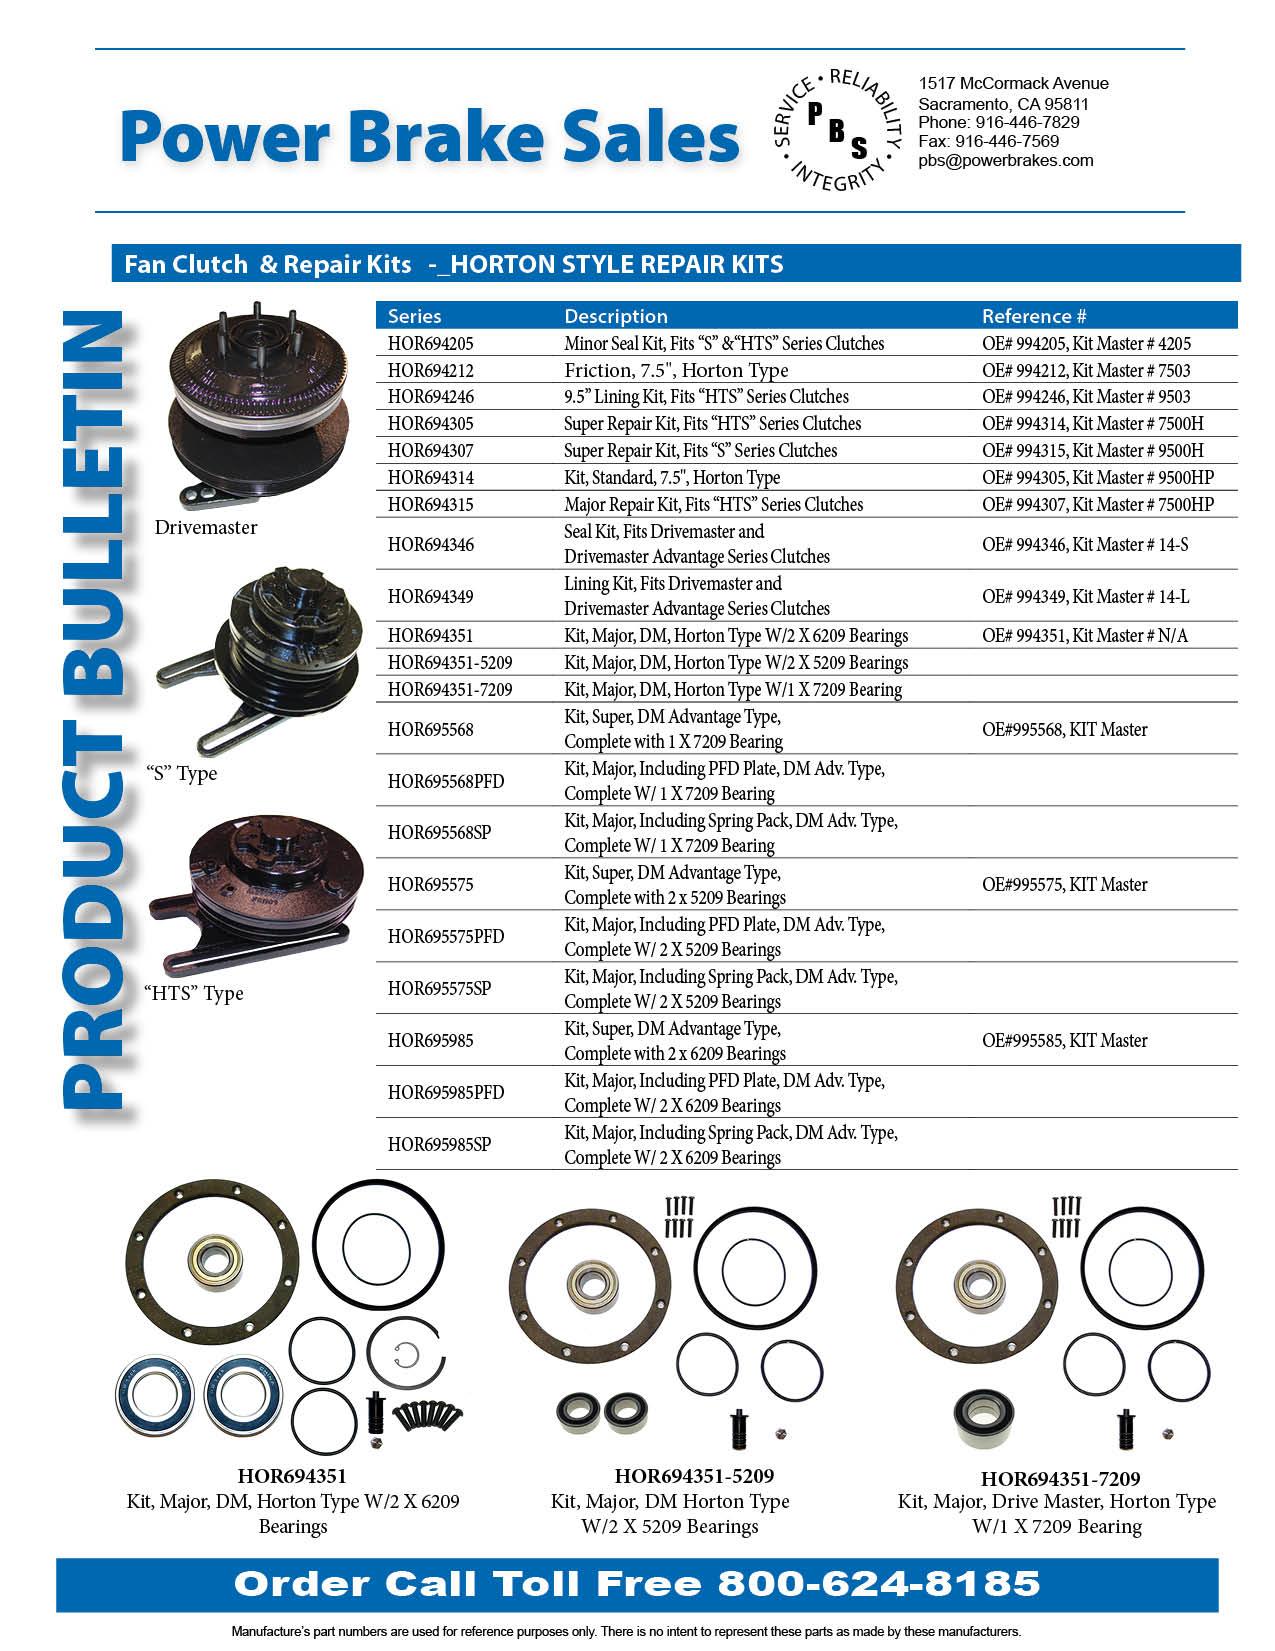 Fan Clutch  & Repair Kits   -_HORTON STYLE REPAIR KITS